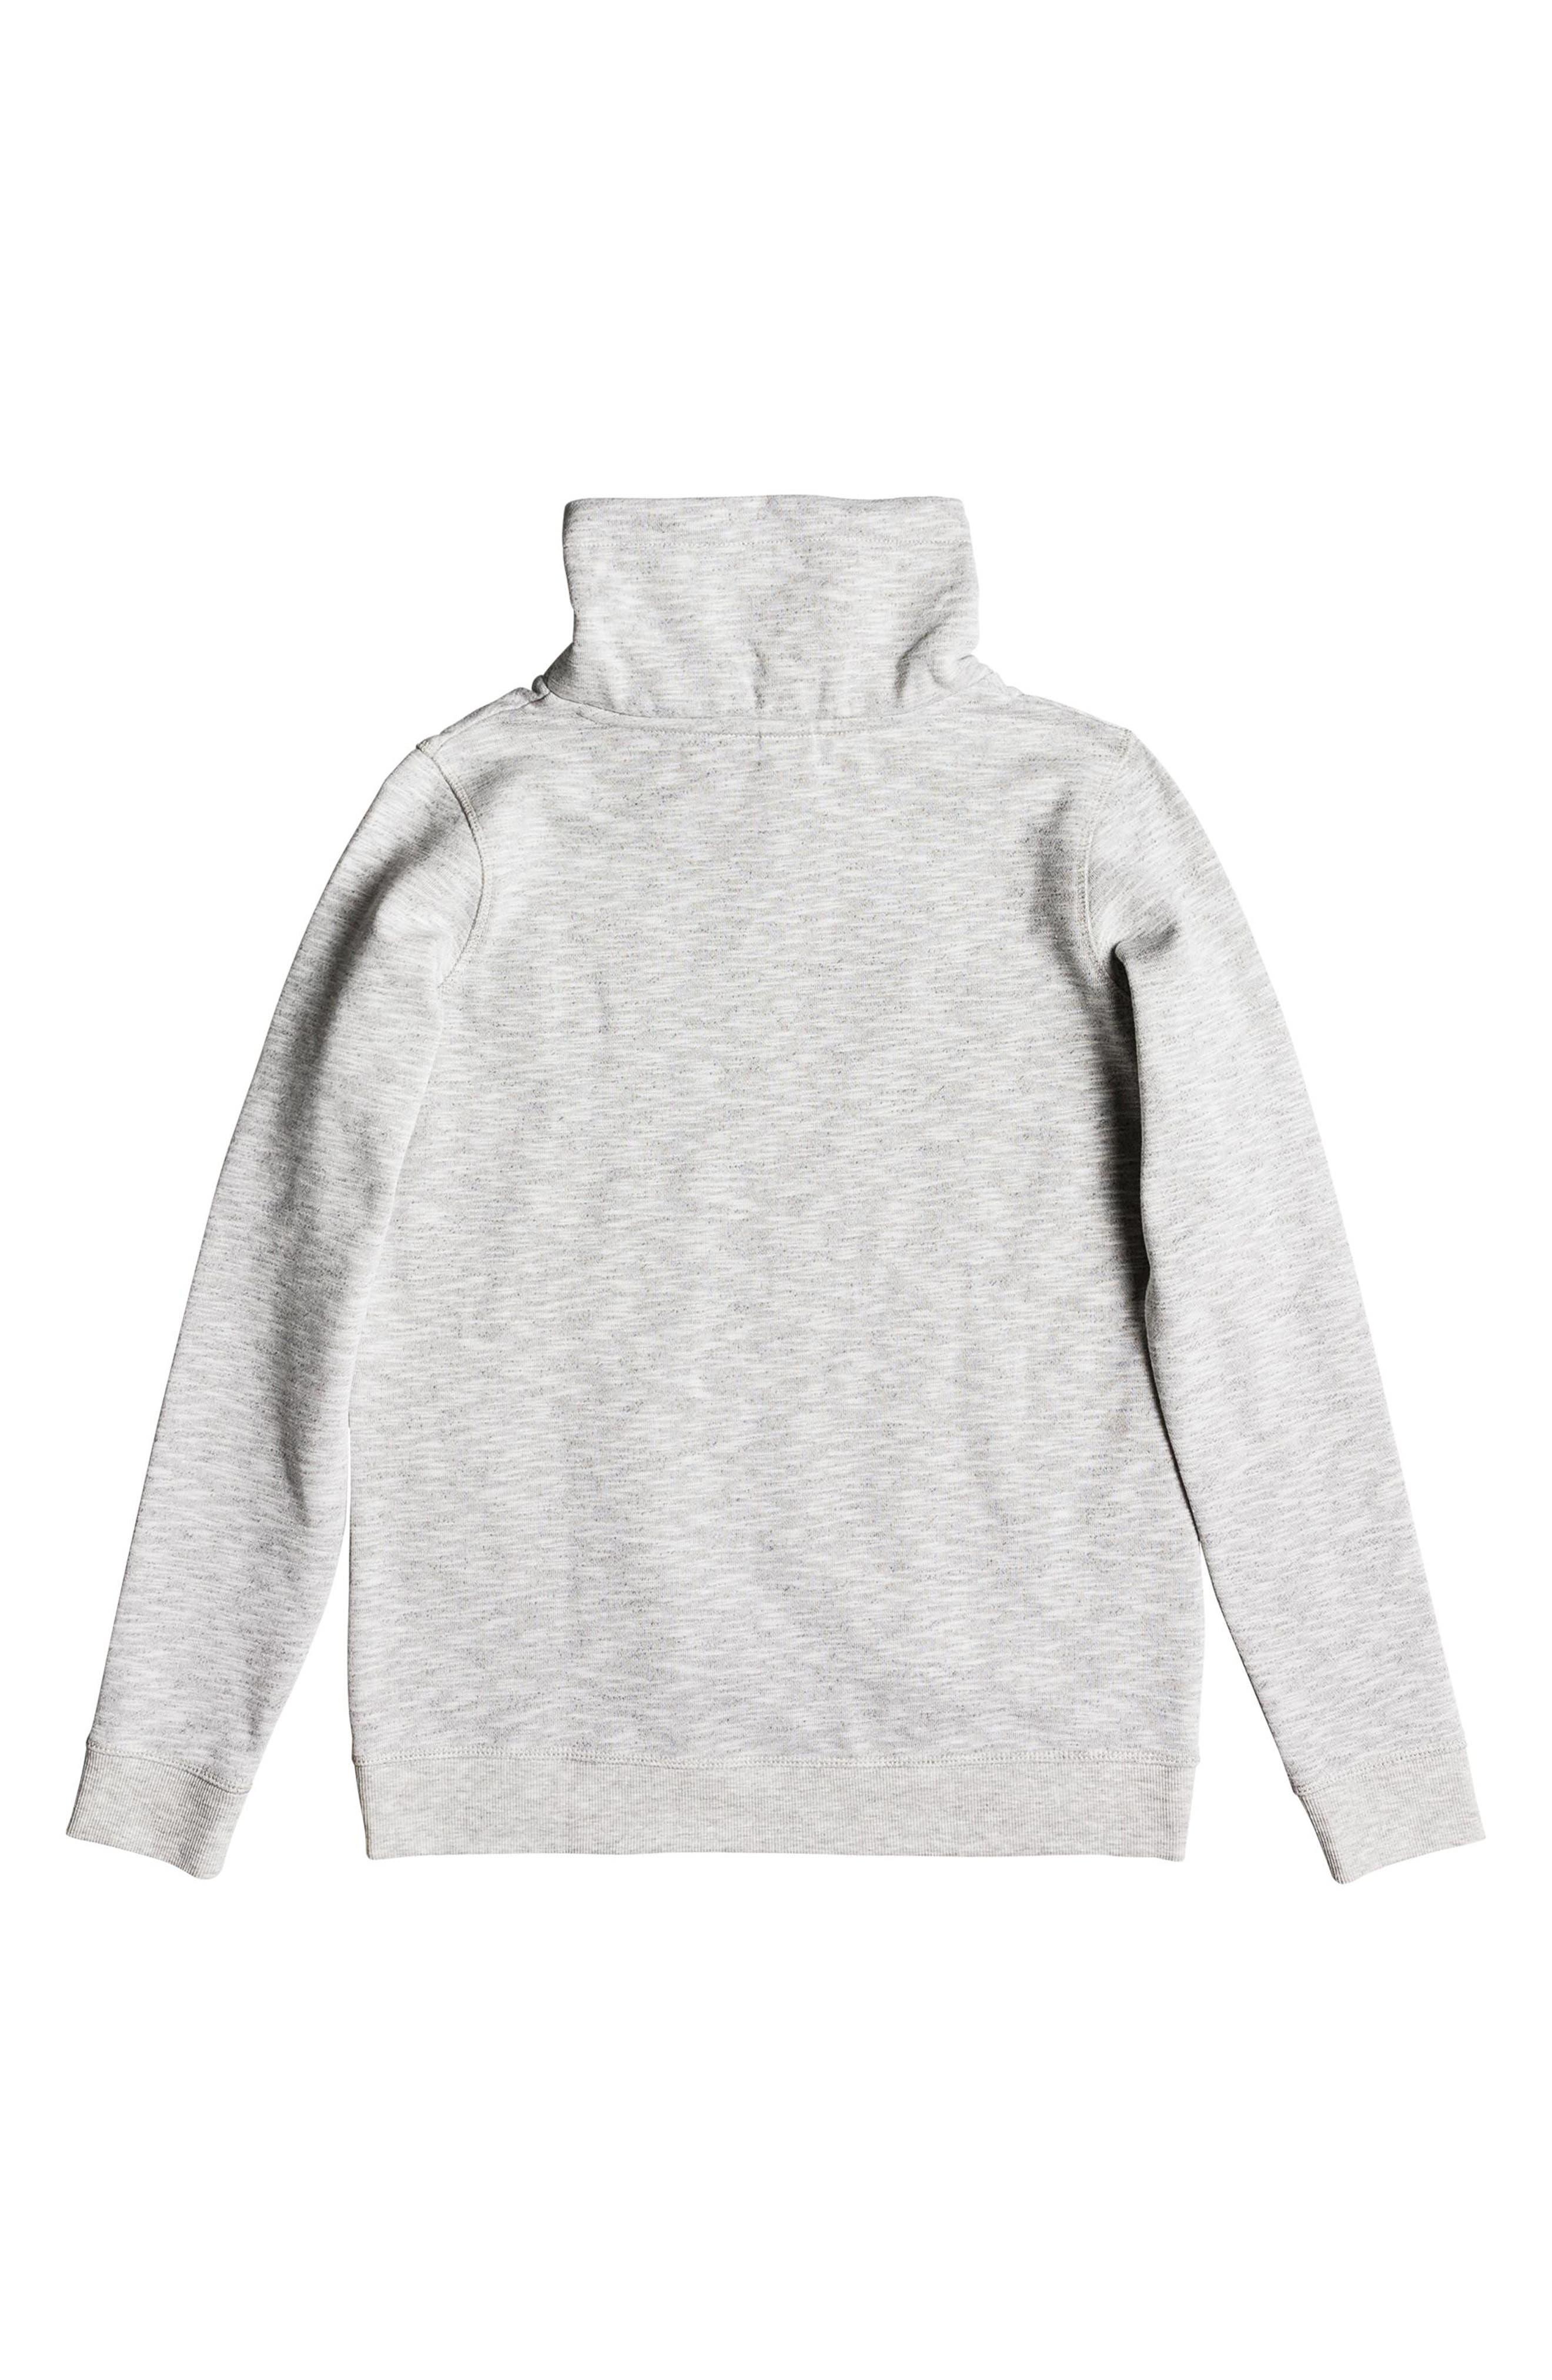 Seasons Change Sweatshirt,                             Alternate thumbnail 5, color,                             HERITAGE HEATHER